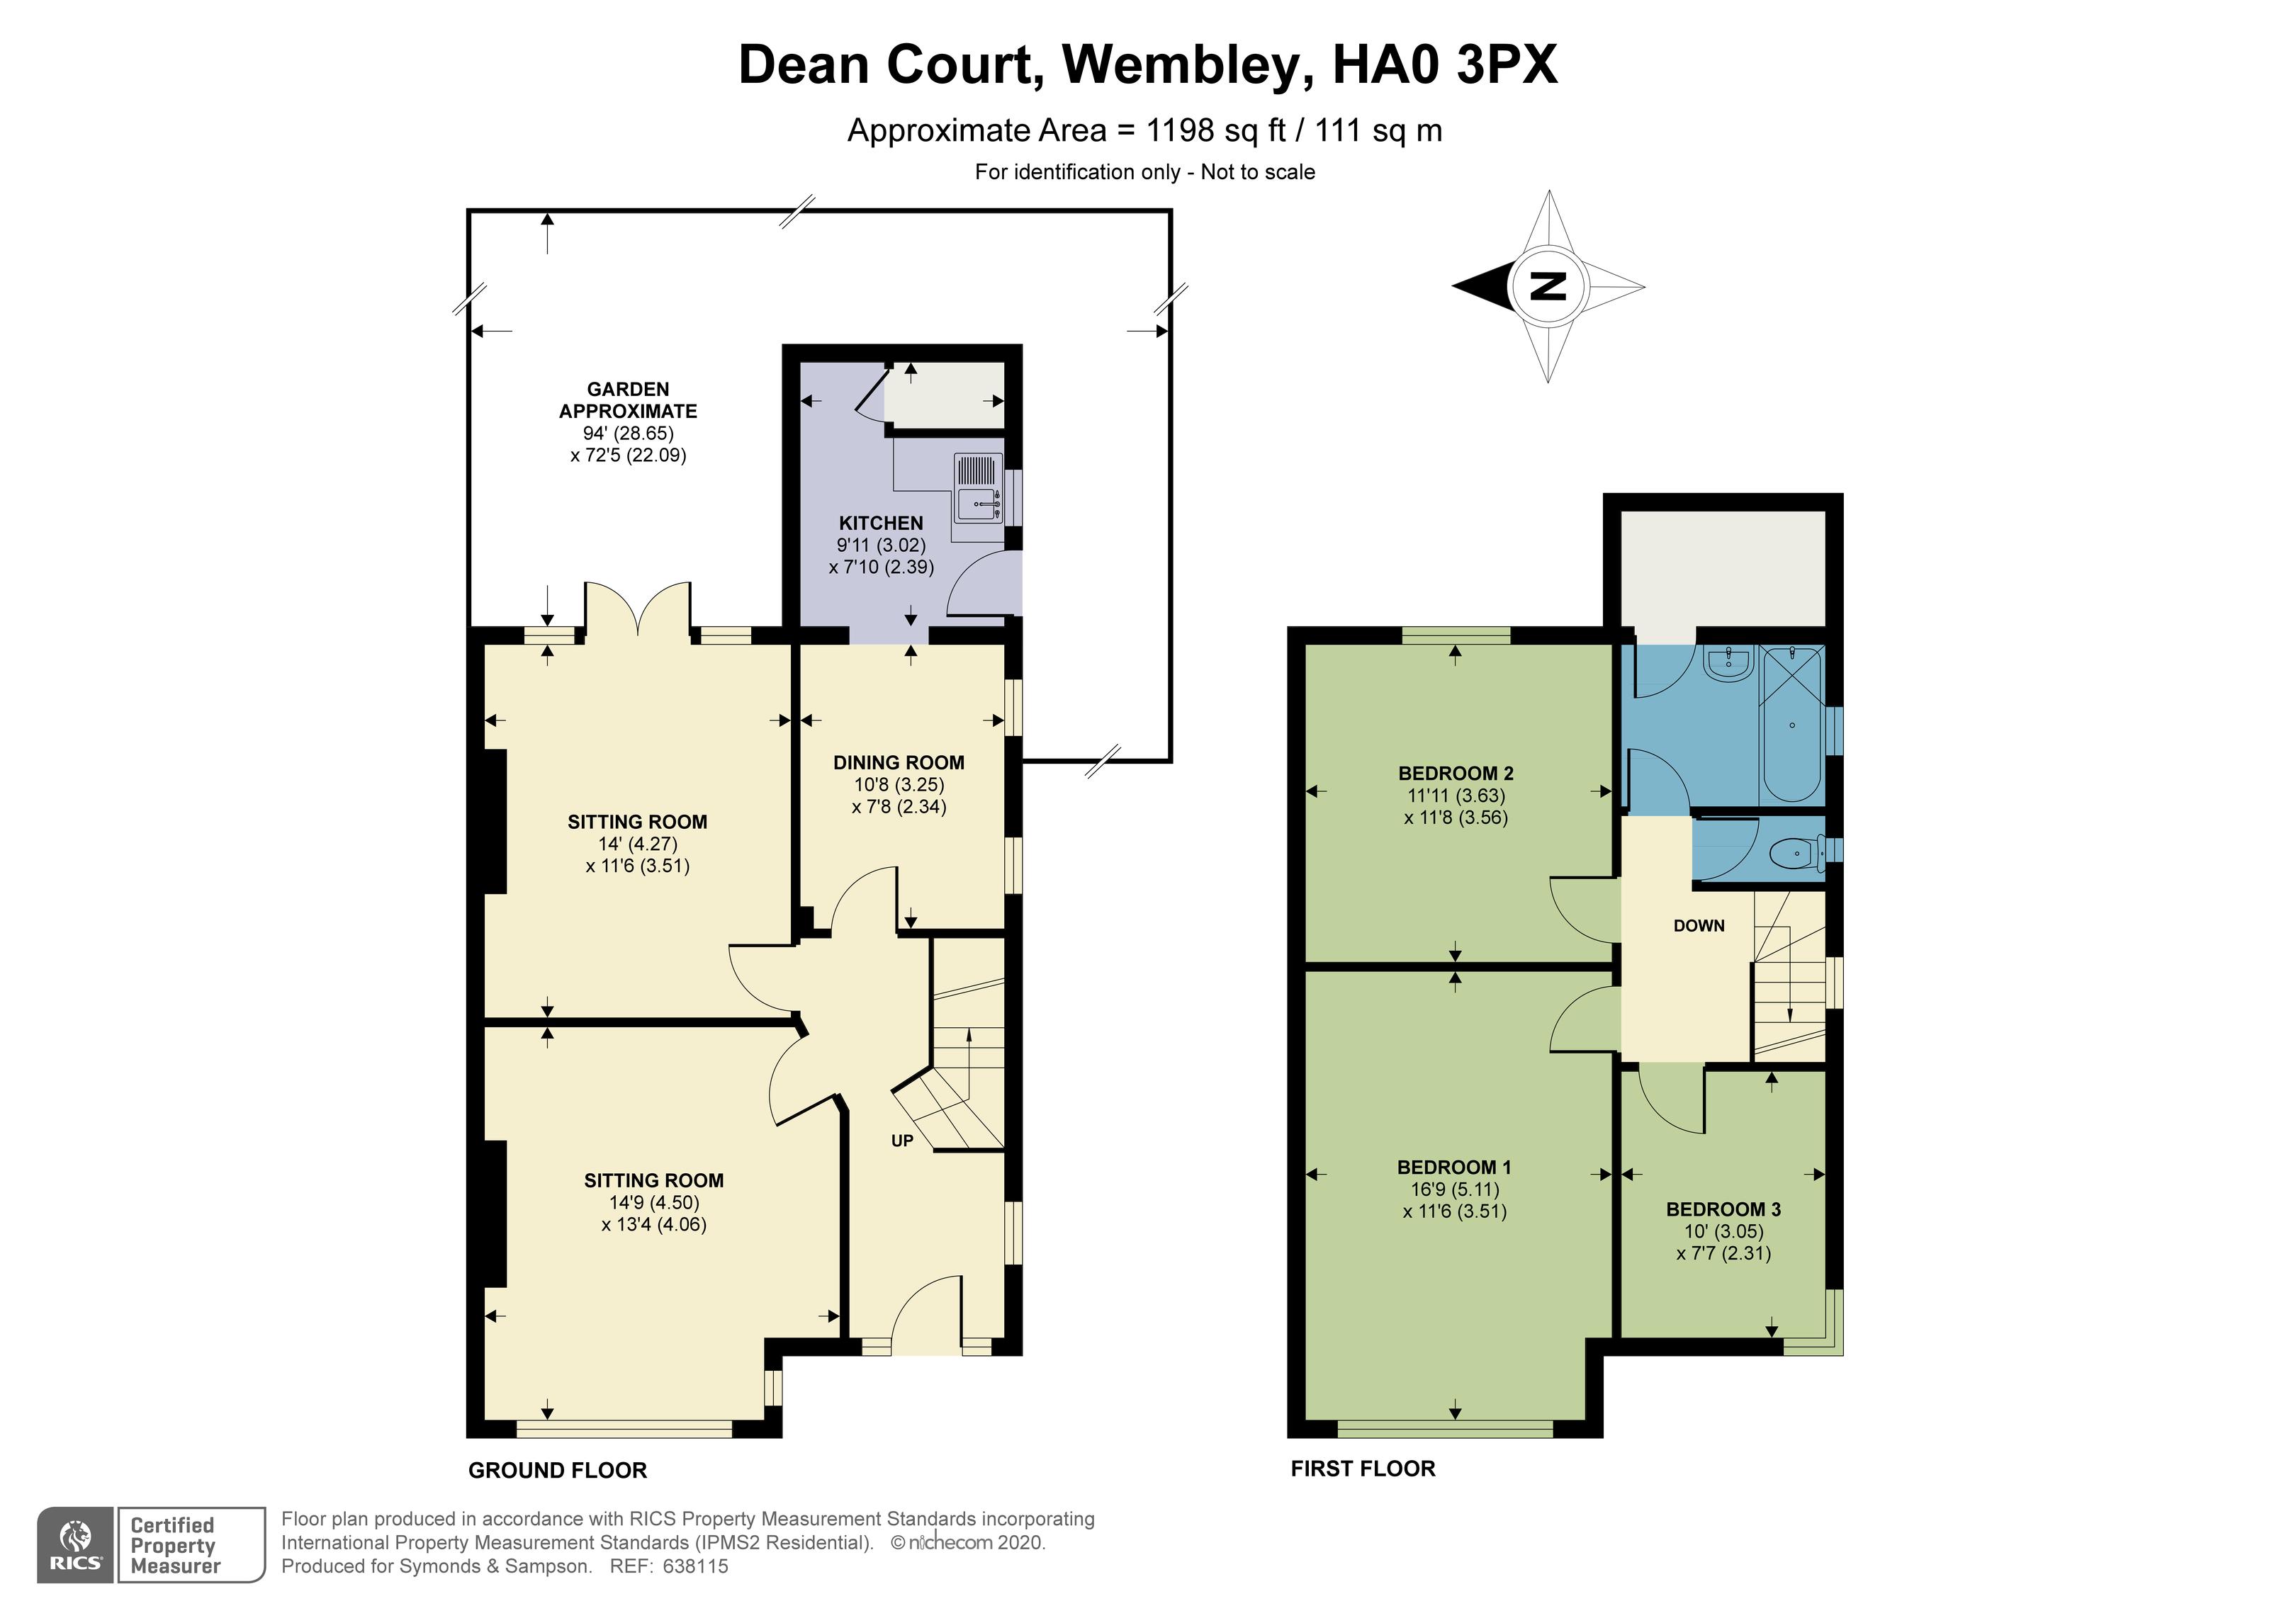 Floorplan - Dean Court, Wembley, HA0 3PX